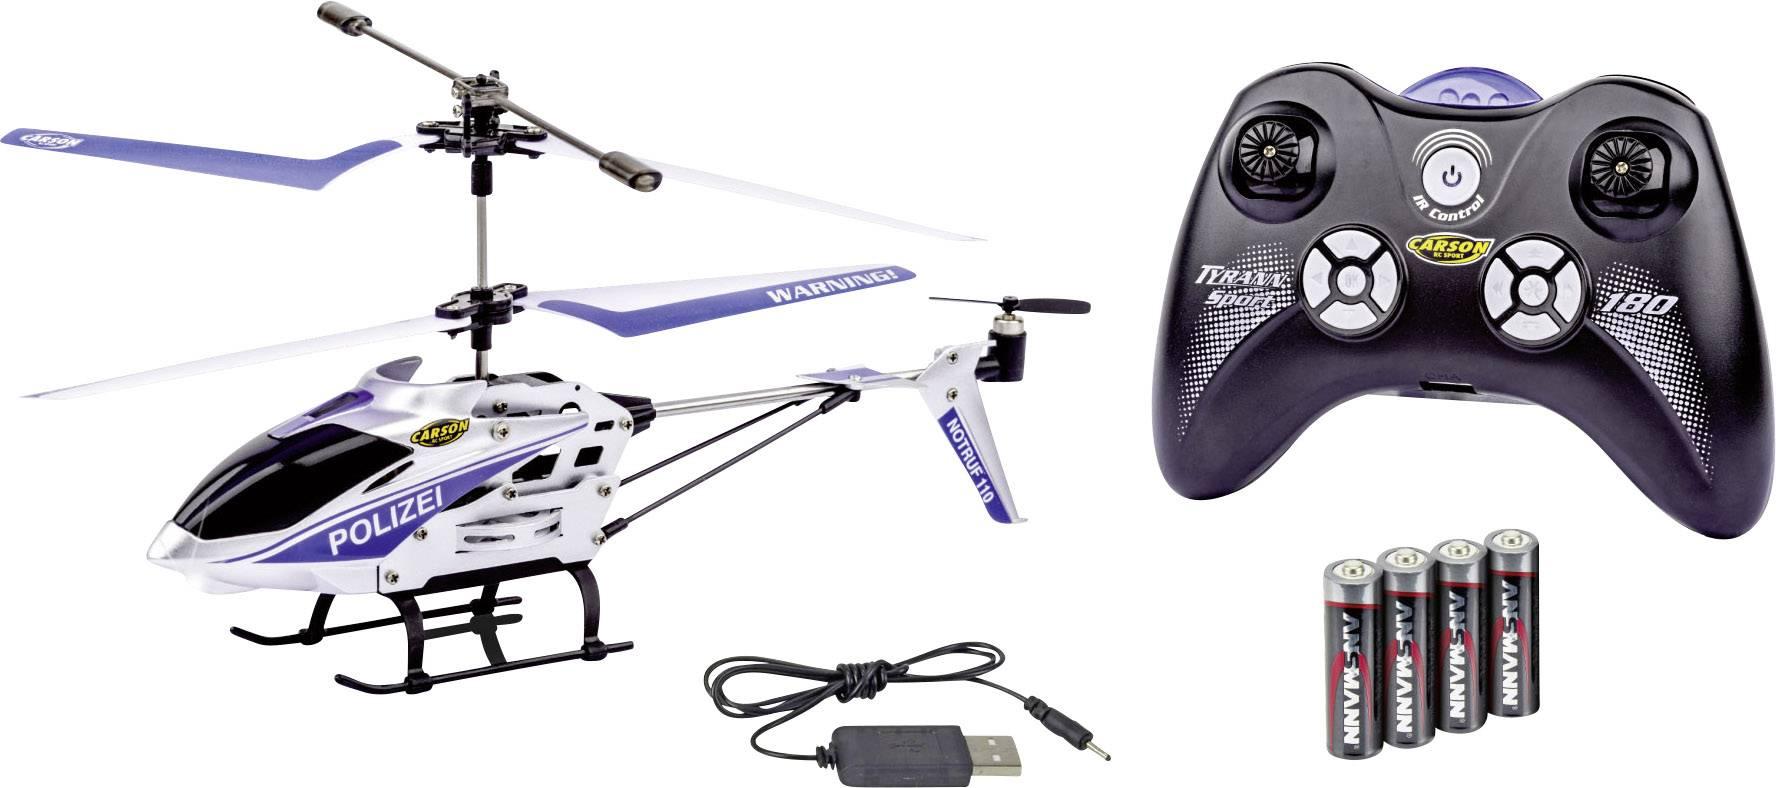 RC model vrtulníku pro začátečníky Carson Modellsport Easy Tyrann 180 Polizei, RtF